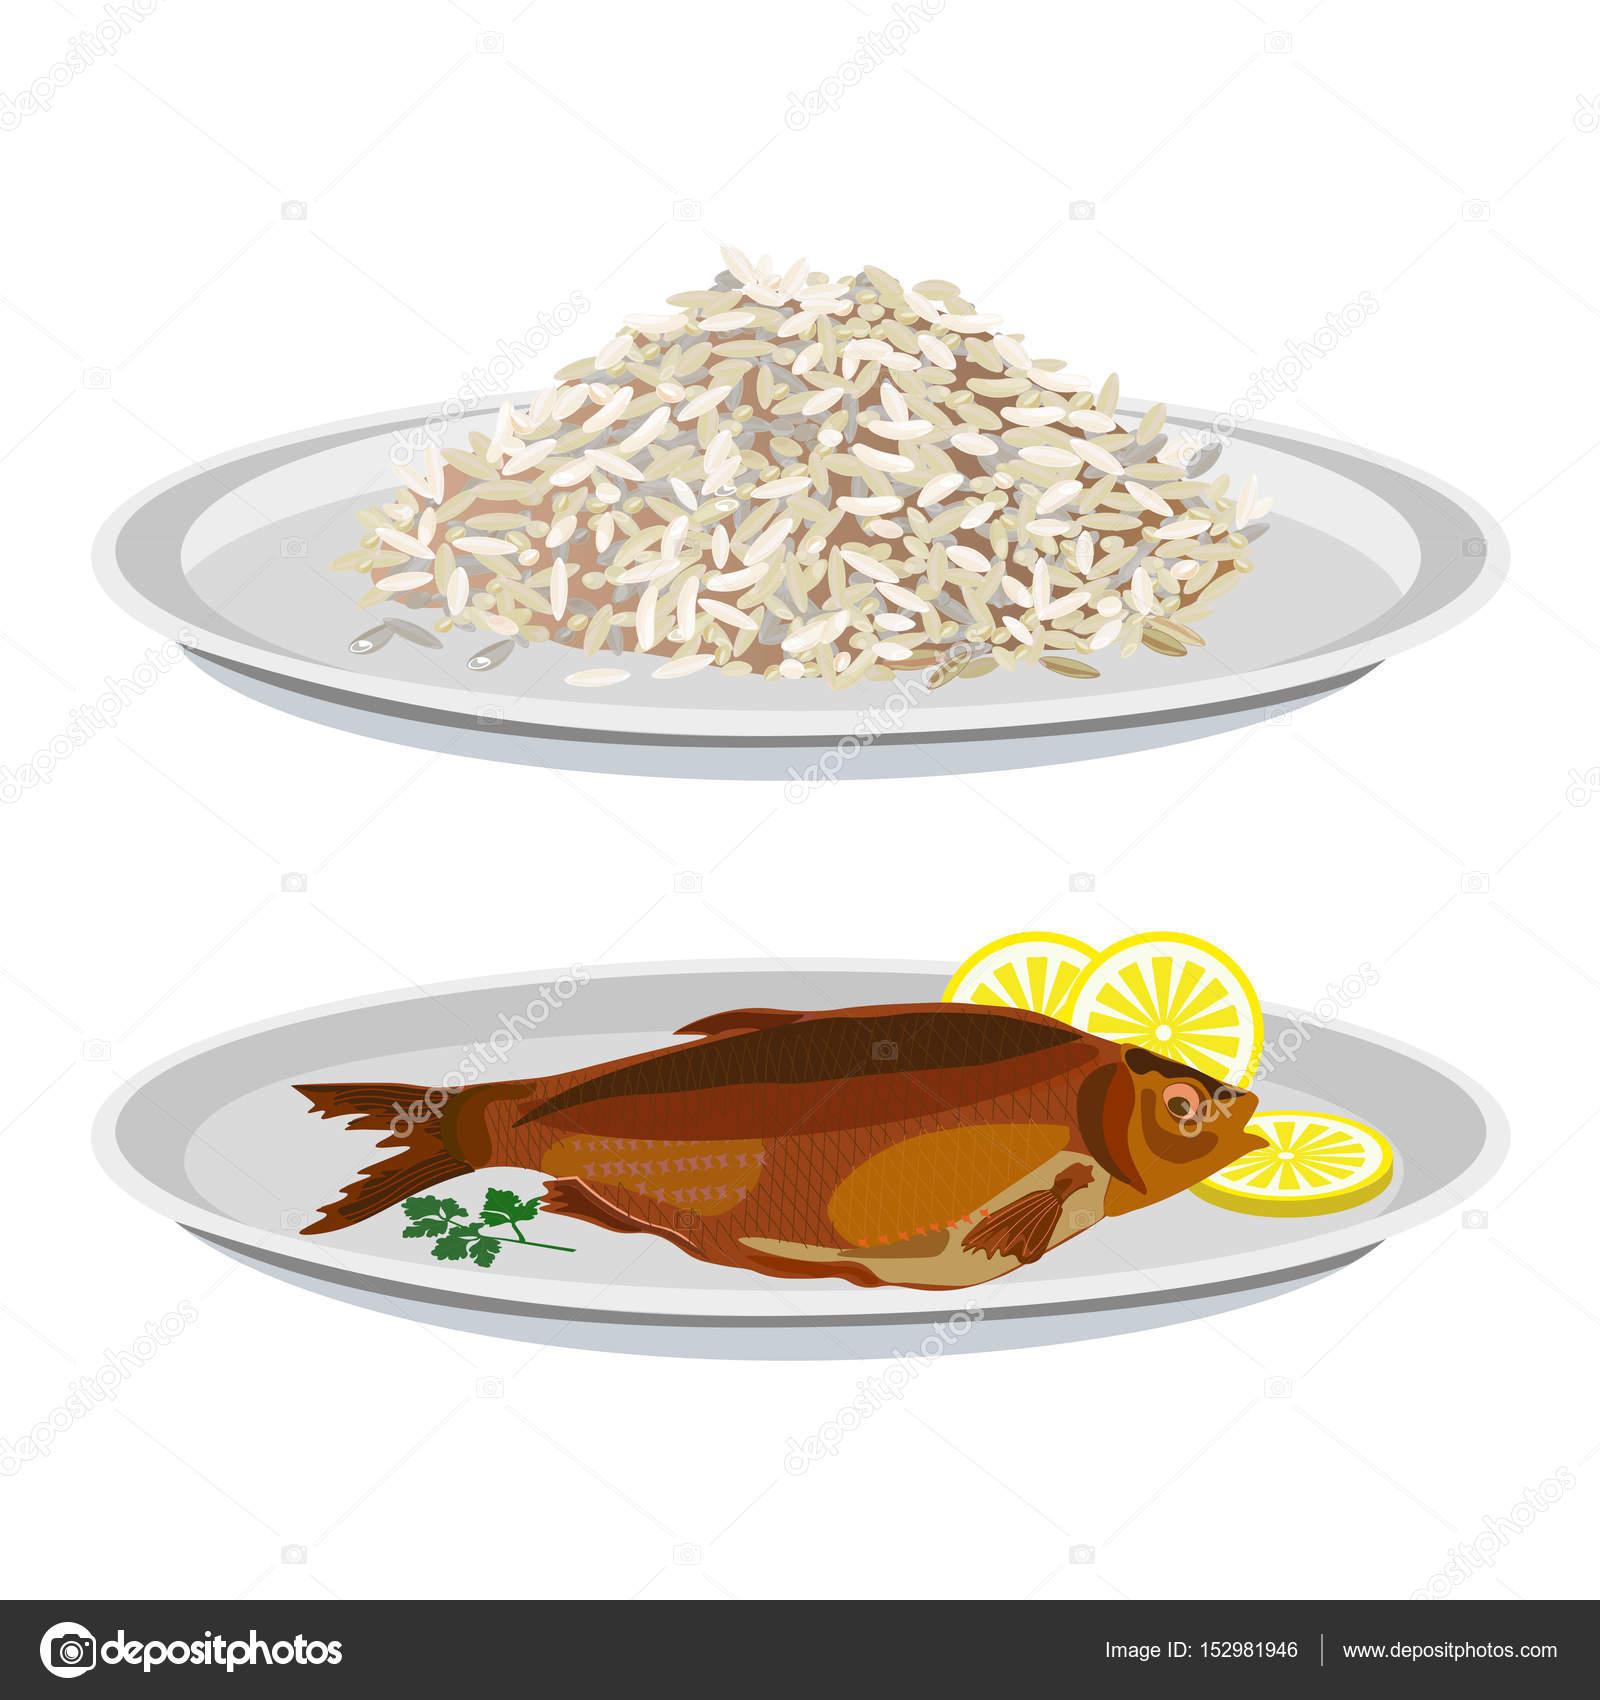 Plates with rice and fried fish \u2014 Stock Vector  sc 1 st  Depositphotos & Plates with rice and fried fish \u2014 Stock Vector © newgena #152981946